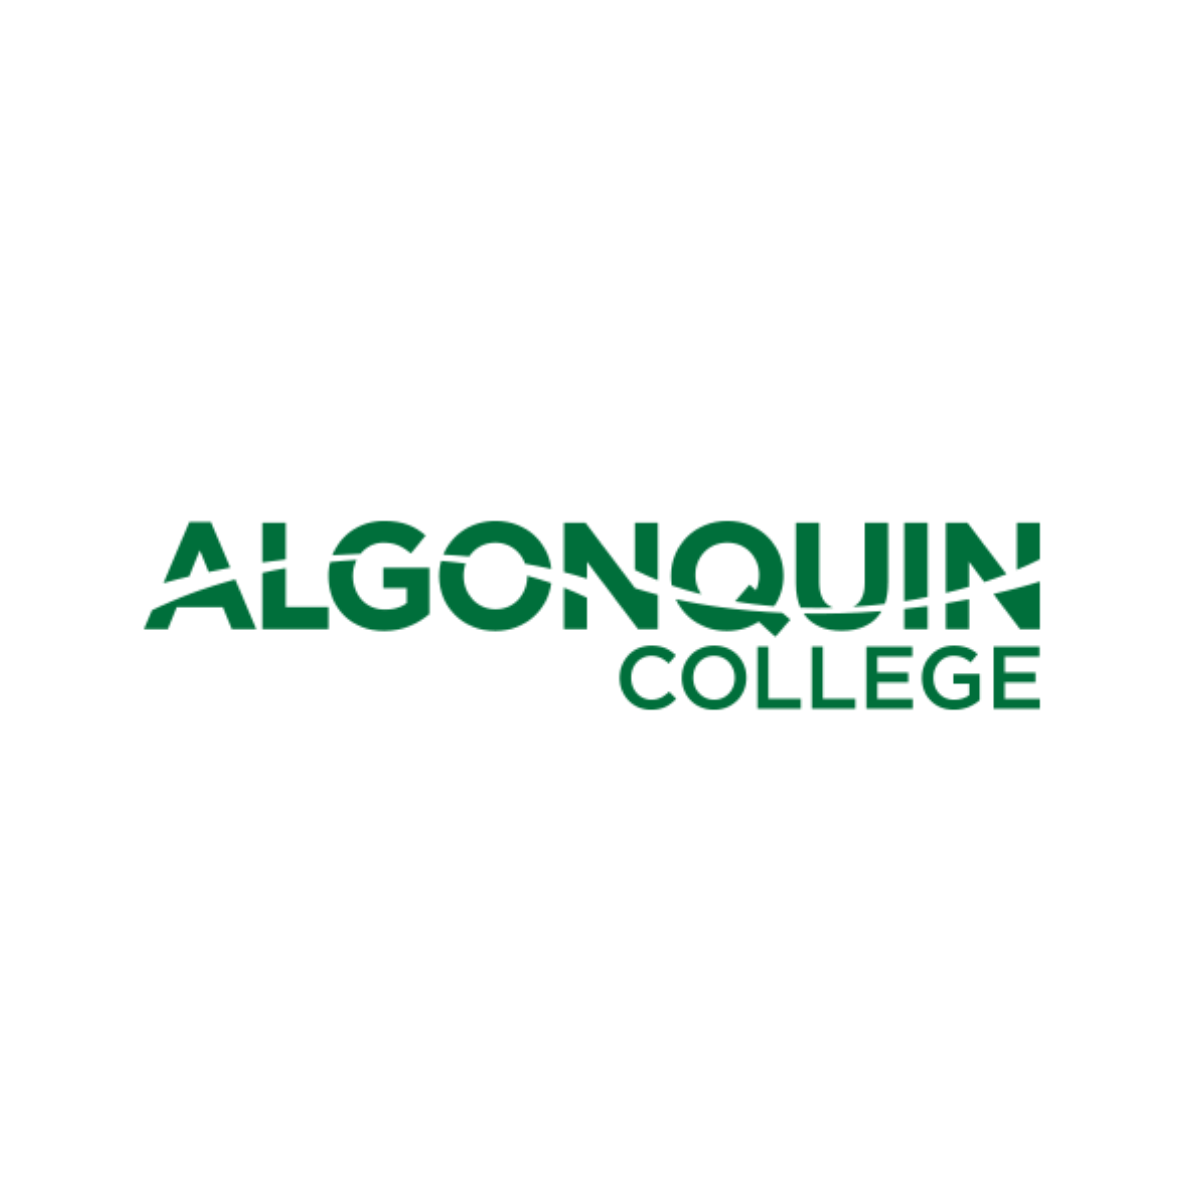 Algonquin College - Ottawa Logo Image